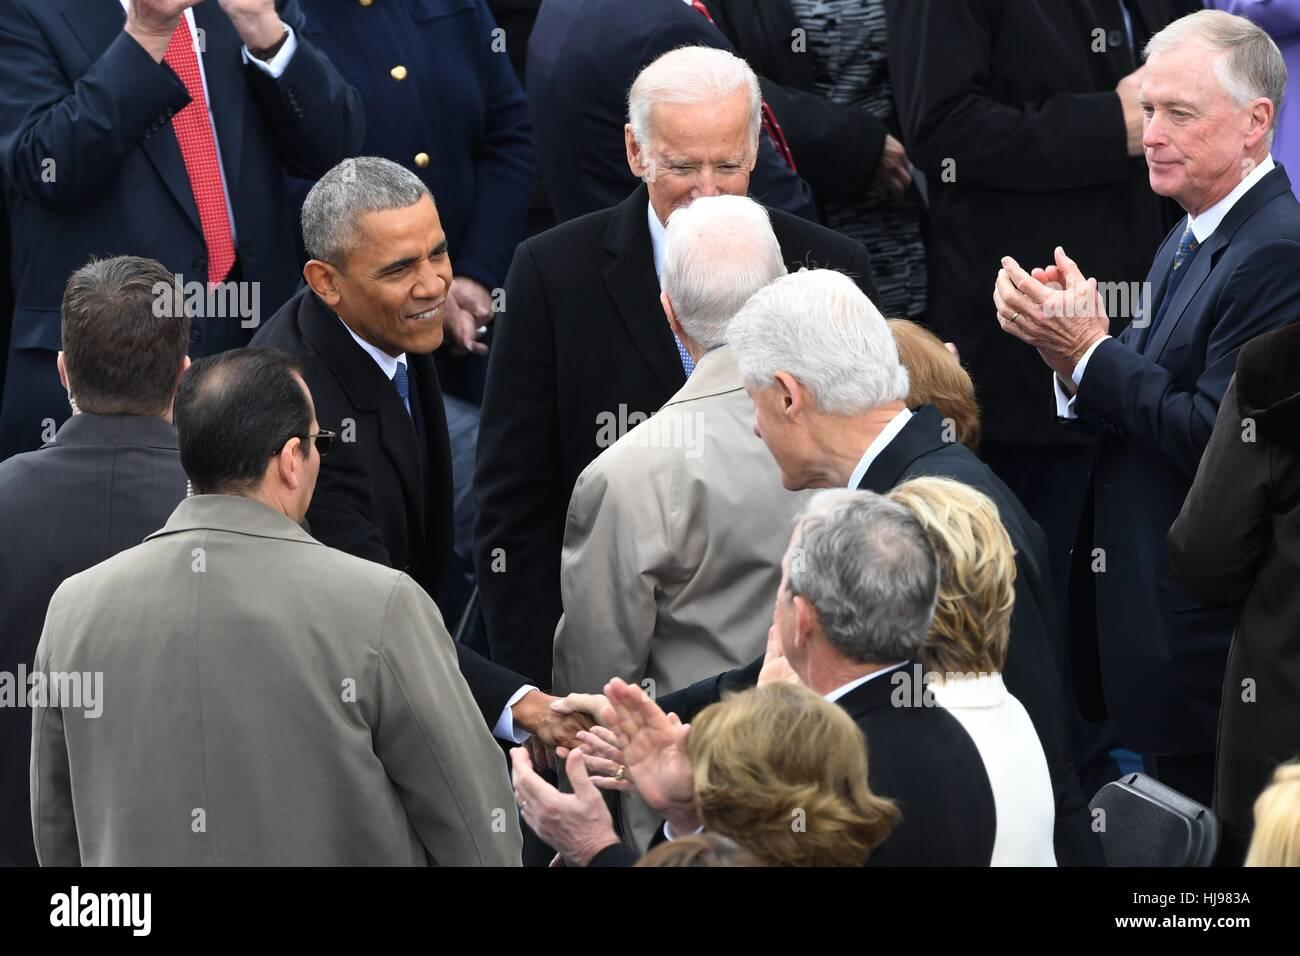 President barack obama greets former president bill clinton as he president barack obama greets former president bill clinton as he arrive for the 68th president inaugural ceremony on capitol hill january 20 m4hsunfo